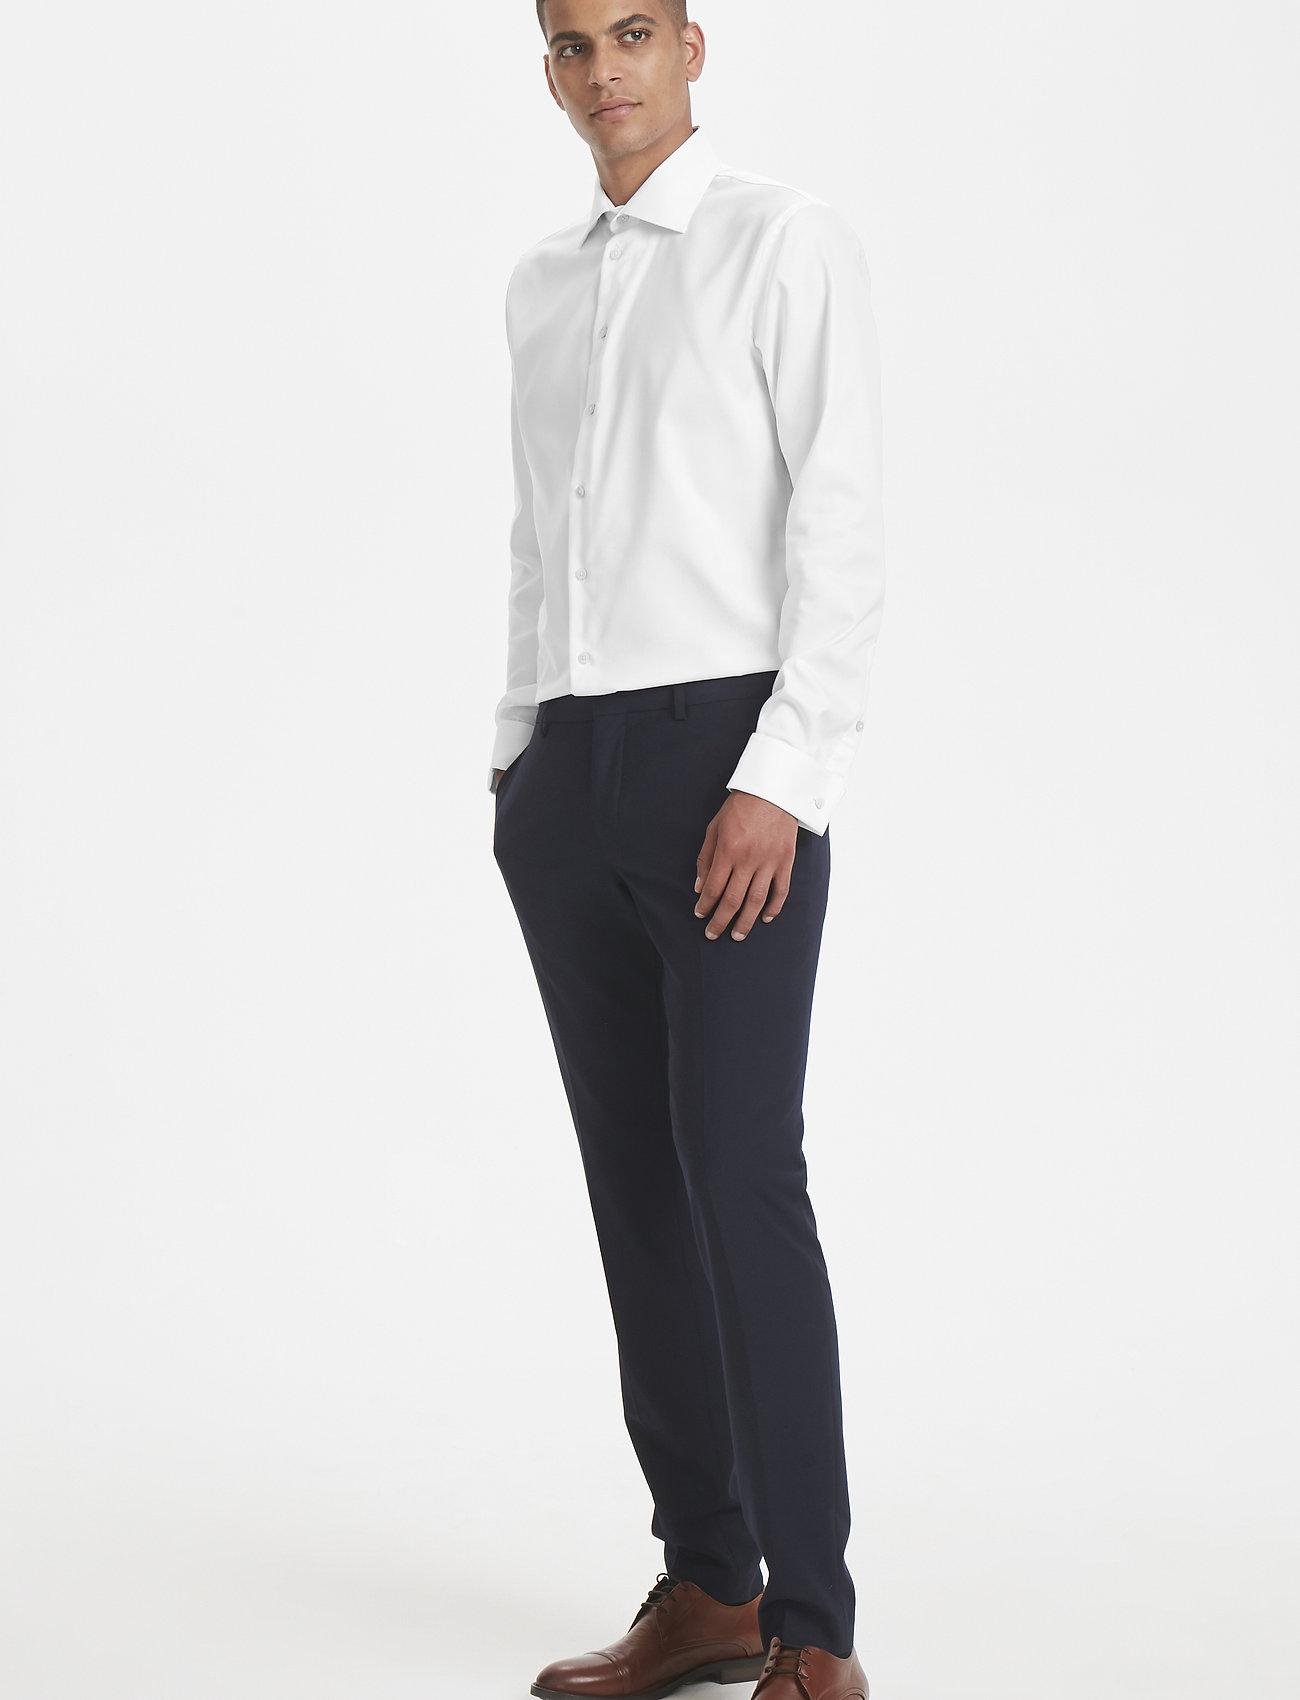 Matinique Marc Double Cuff - Chemises WHITE lWiIo6TG